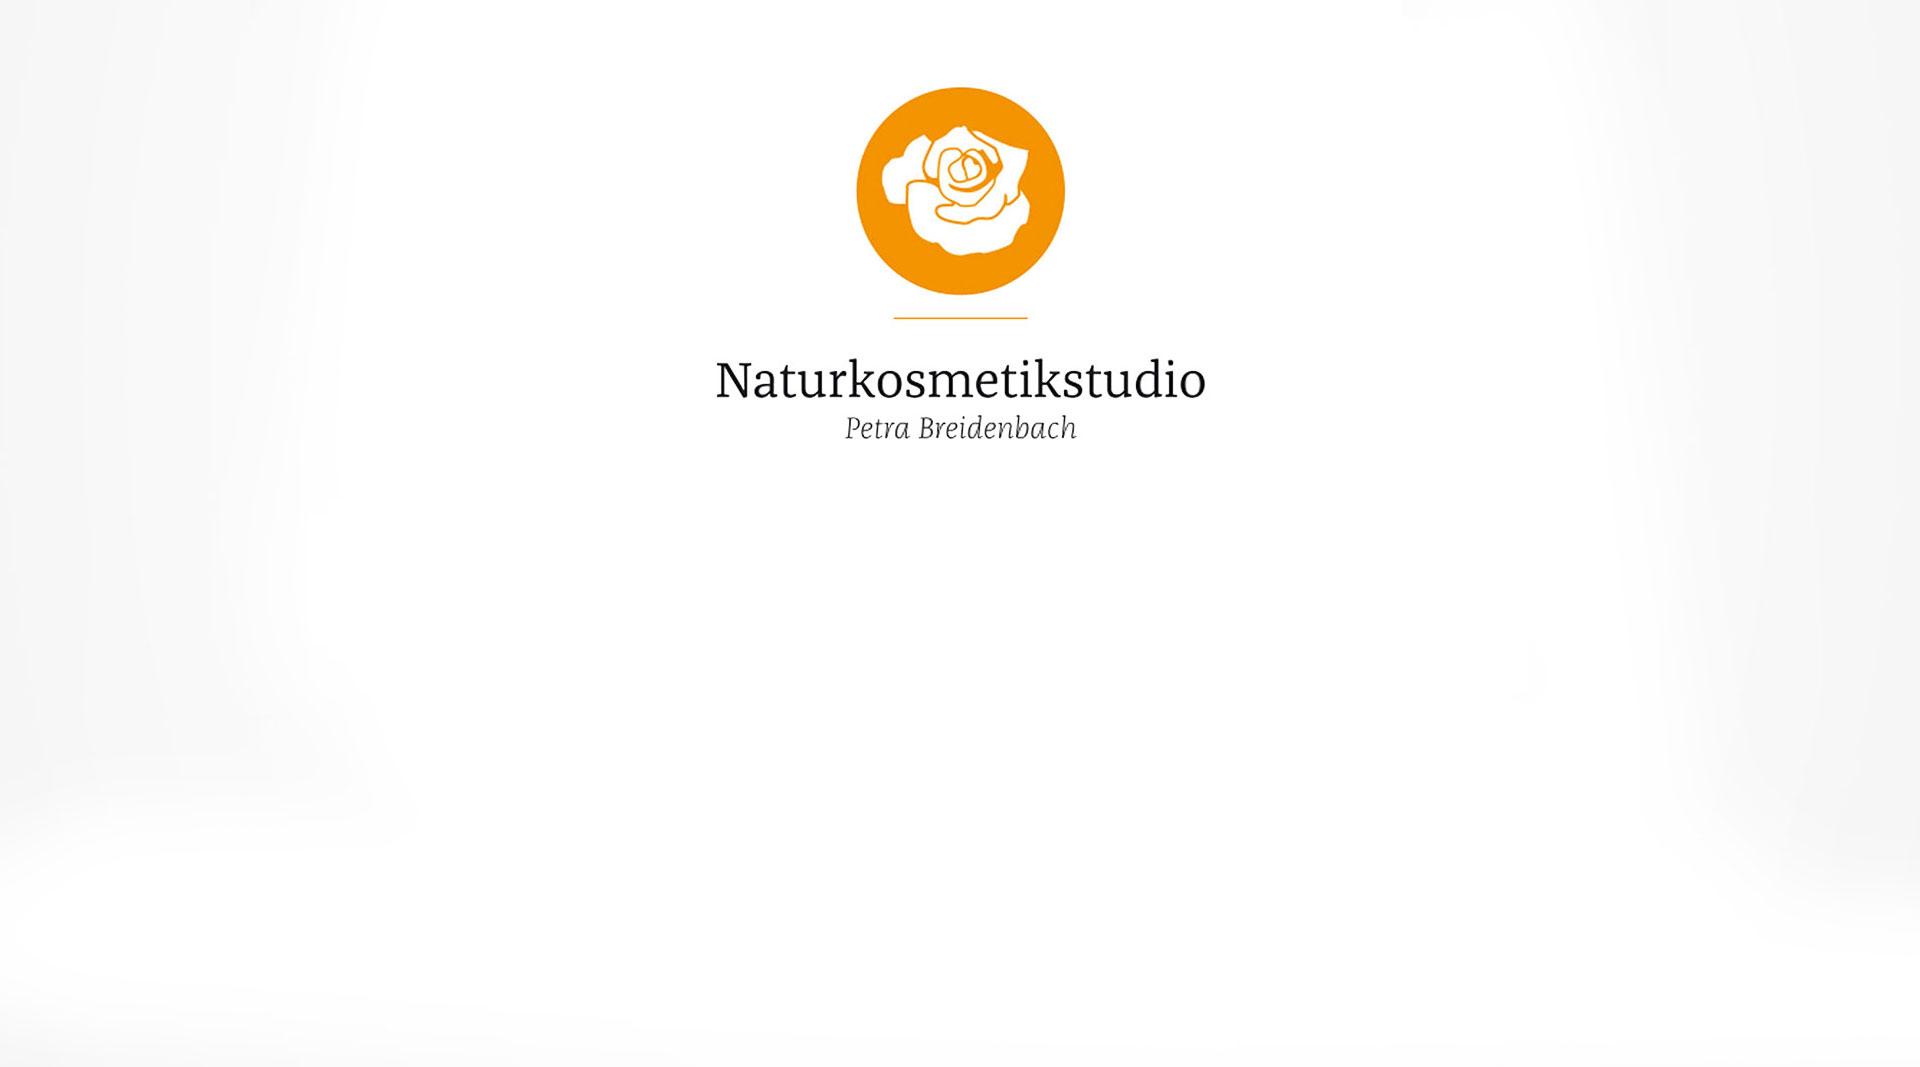 Logo Naturkosmetikstudio Petra Breidenbach